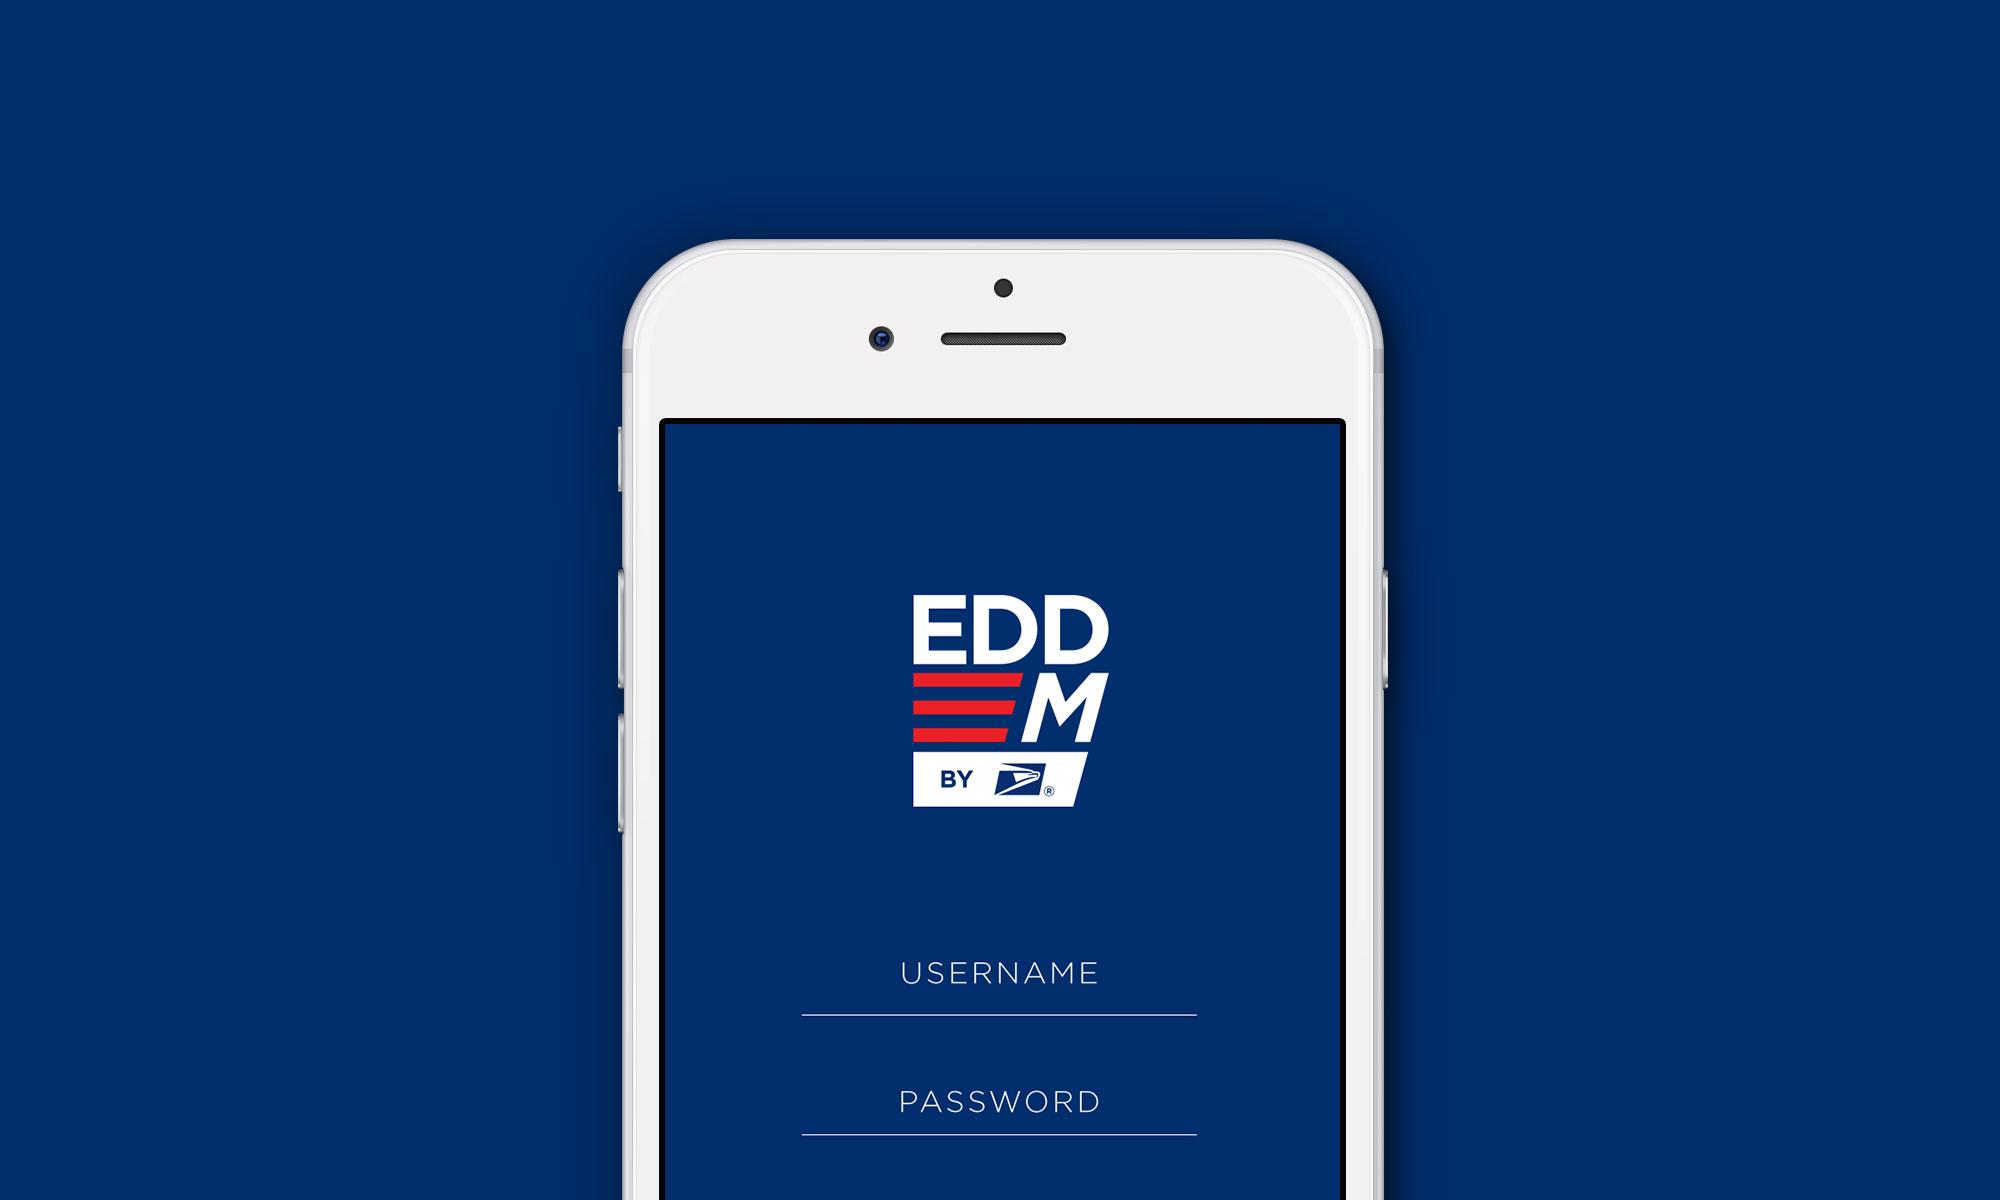 EDDM_2000x1200